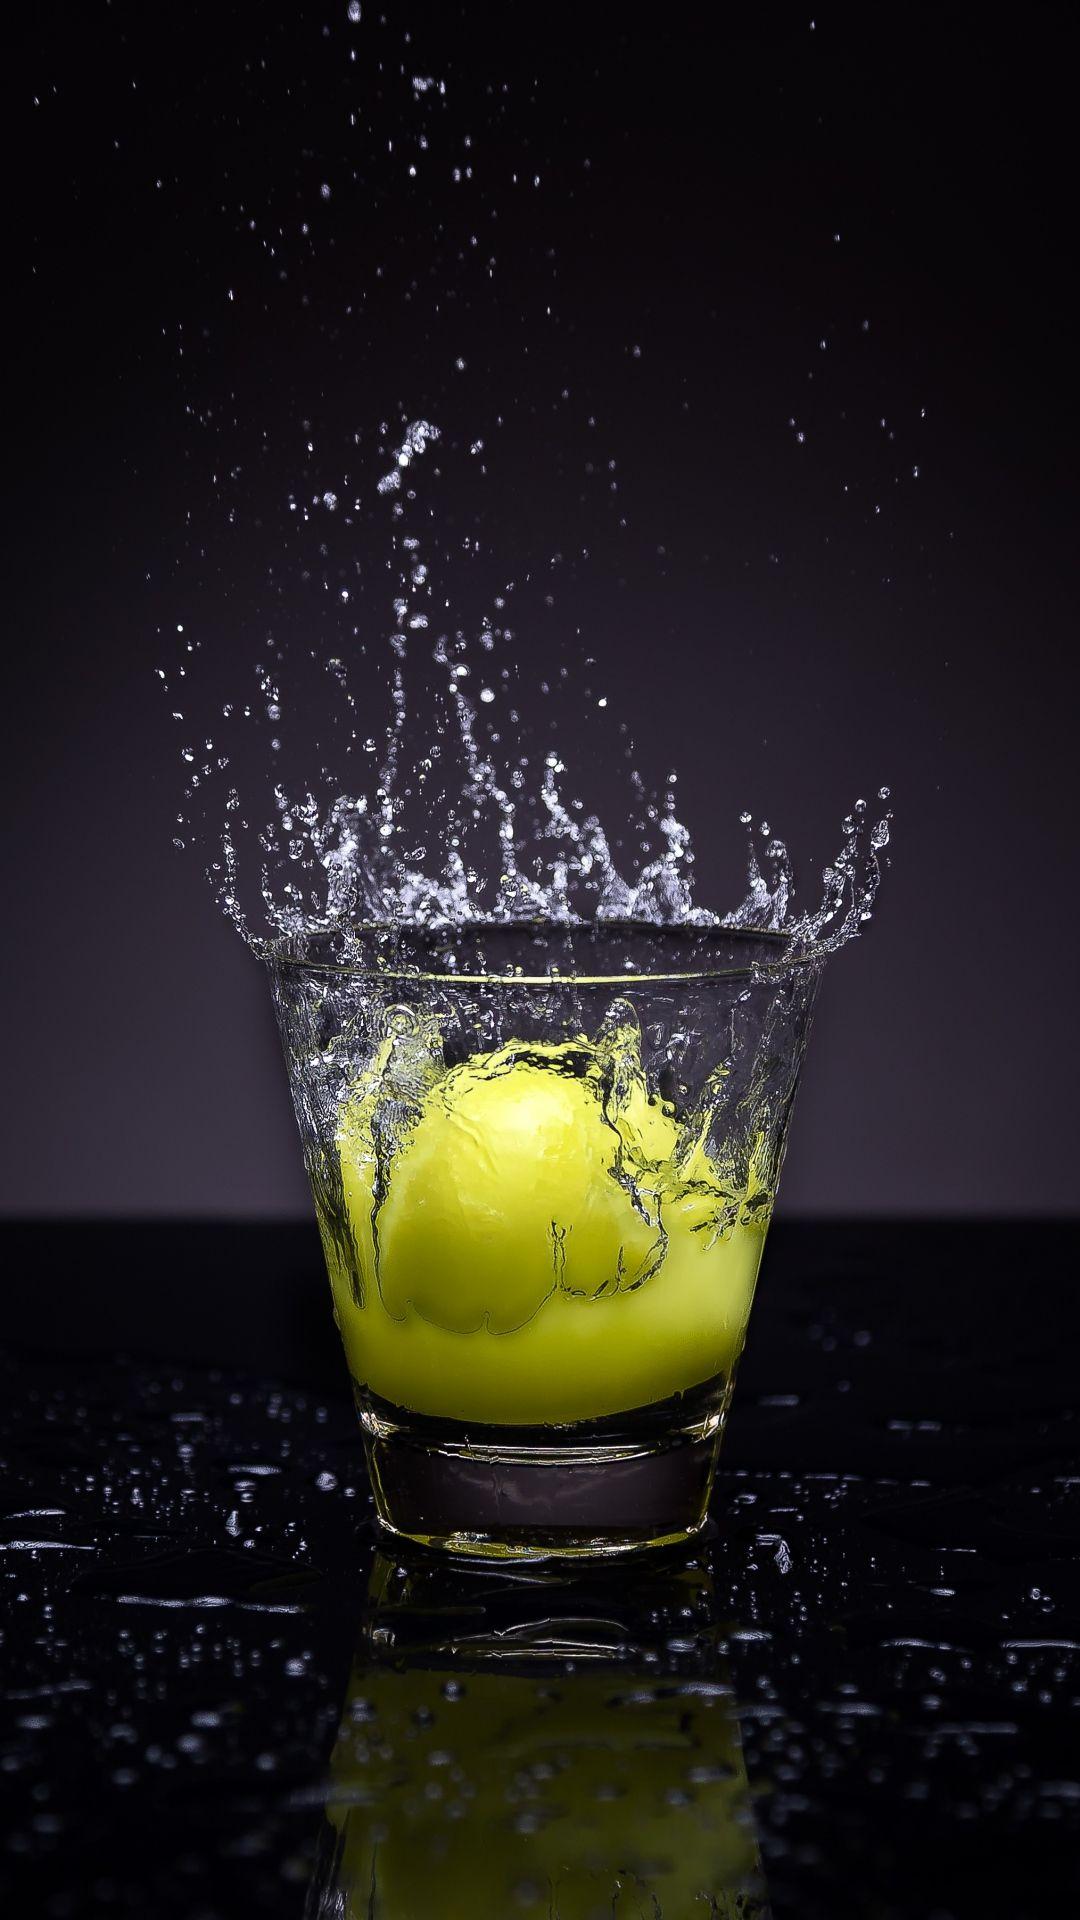 lemon, glass, water, spray